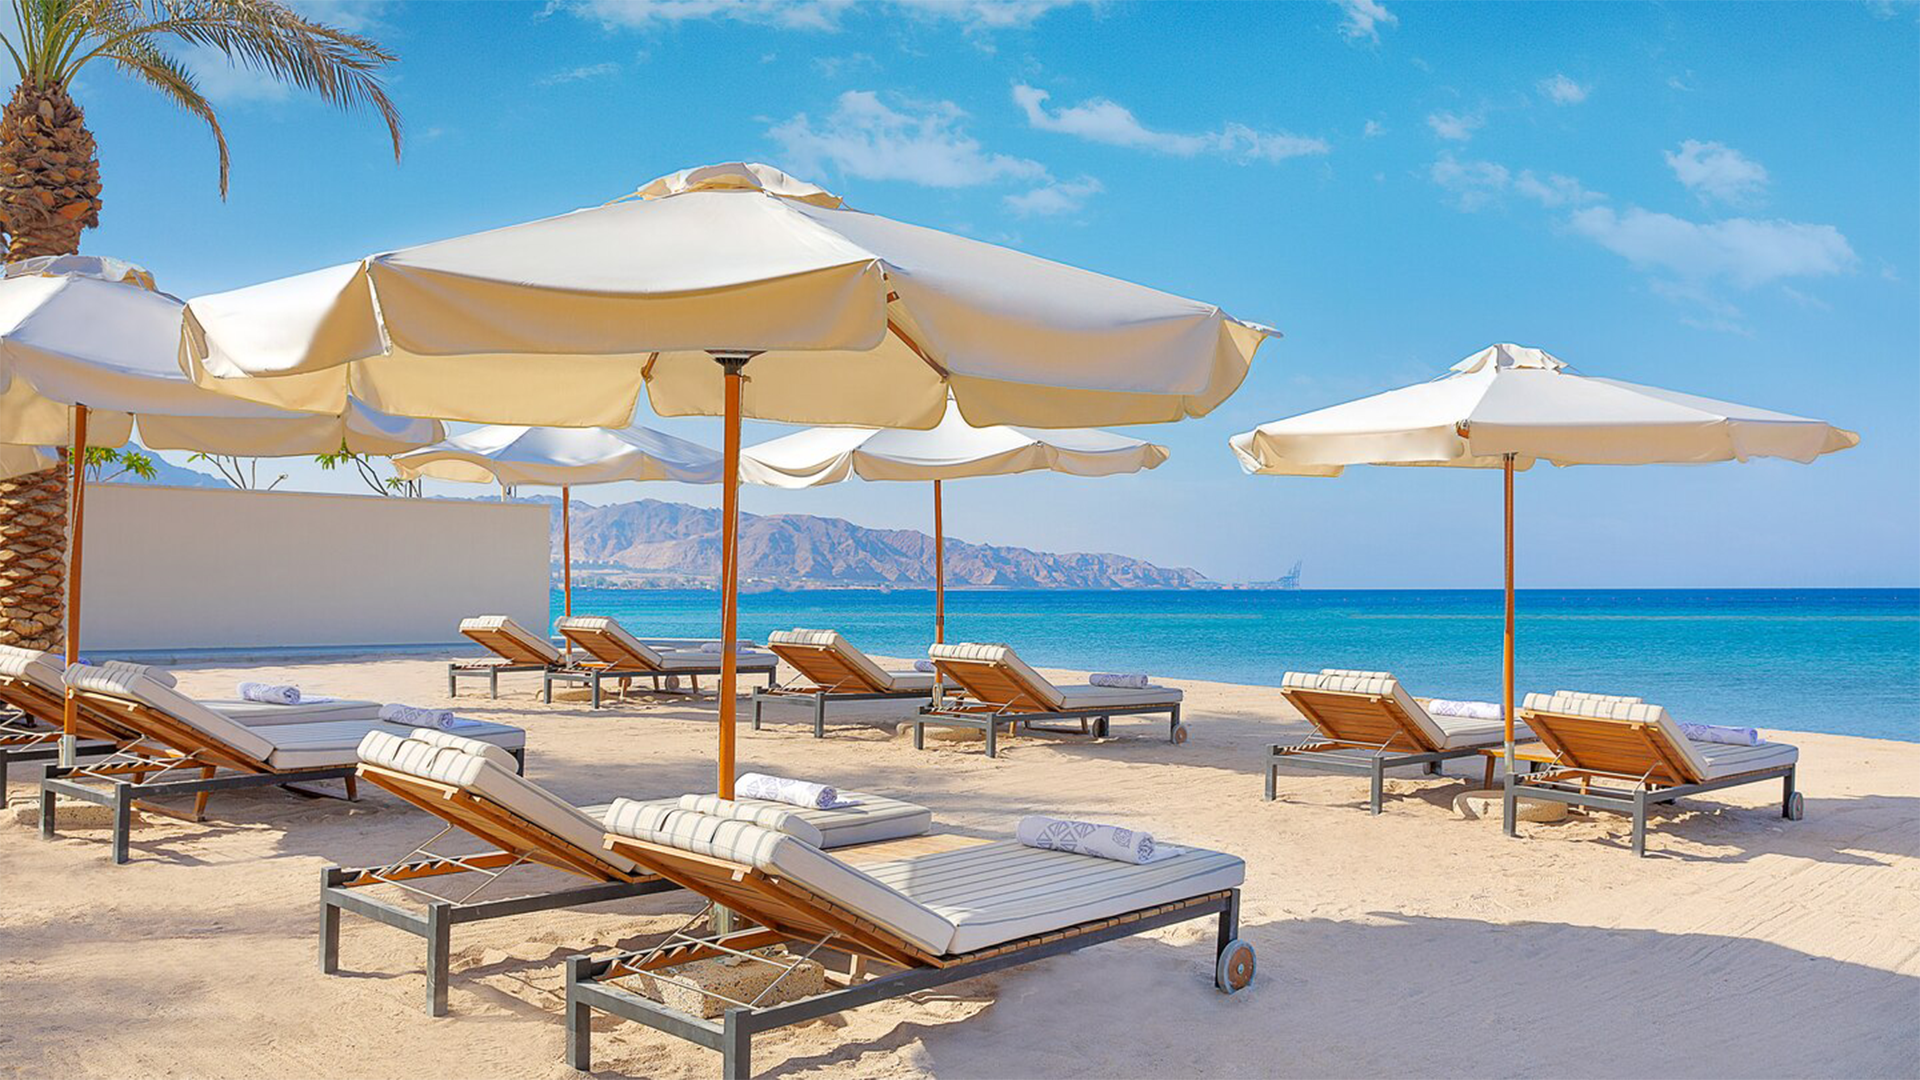 Al-Manana-A-Luxury-Collection-Beach-Hotel-Aqaba-Jordan